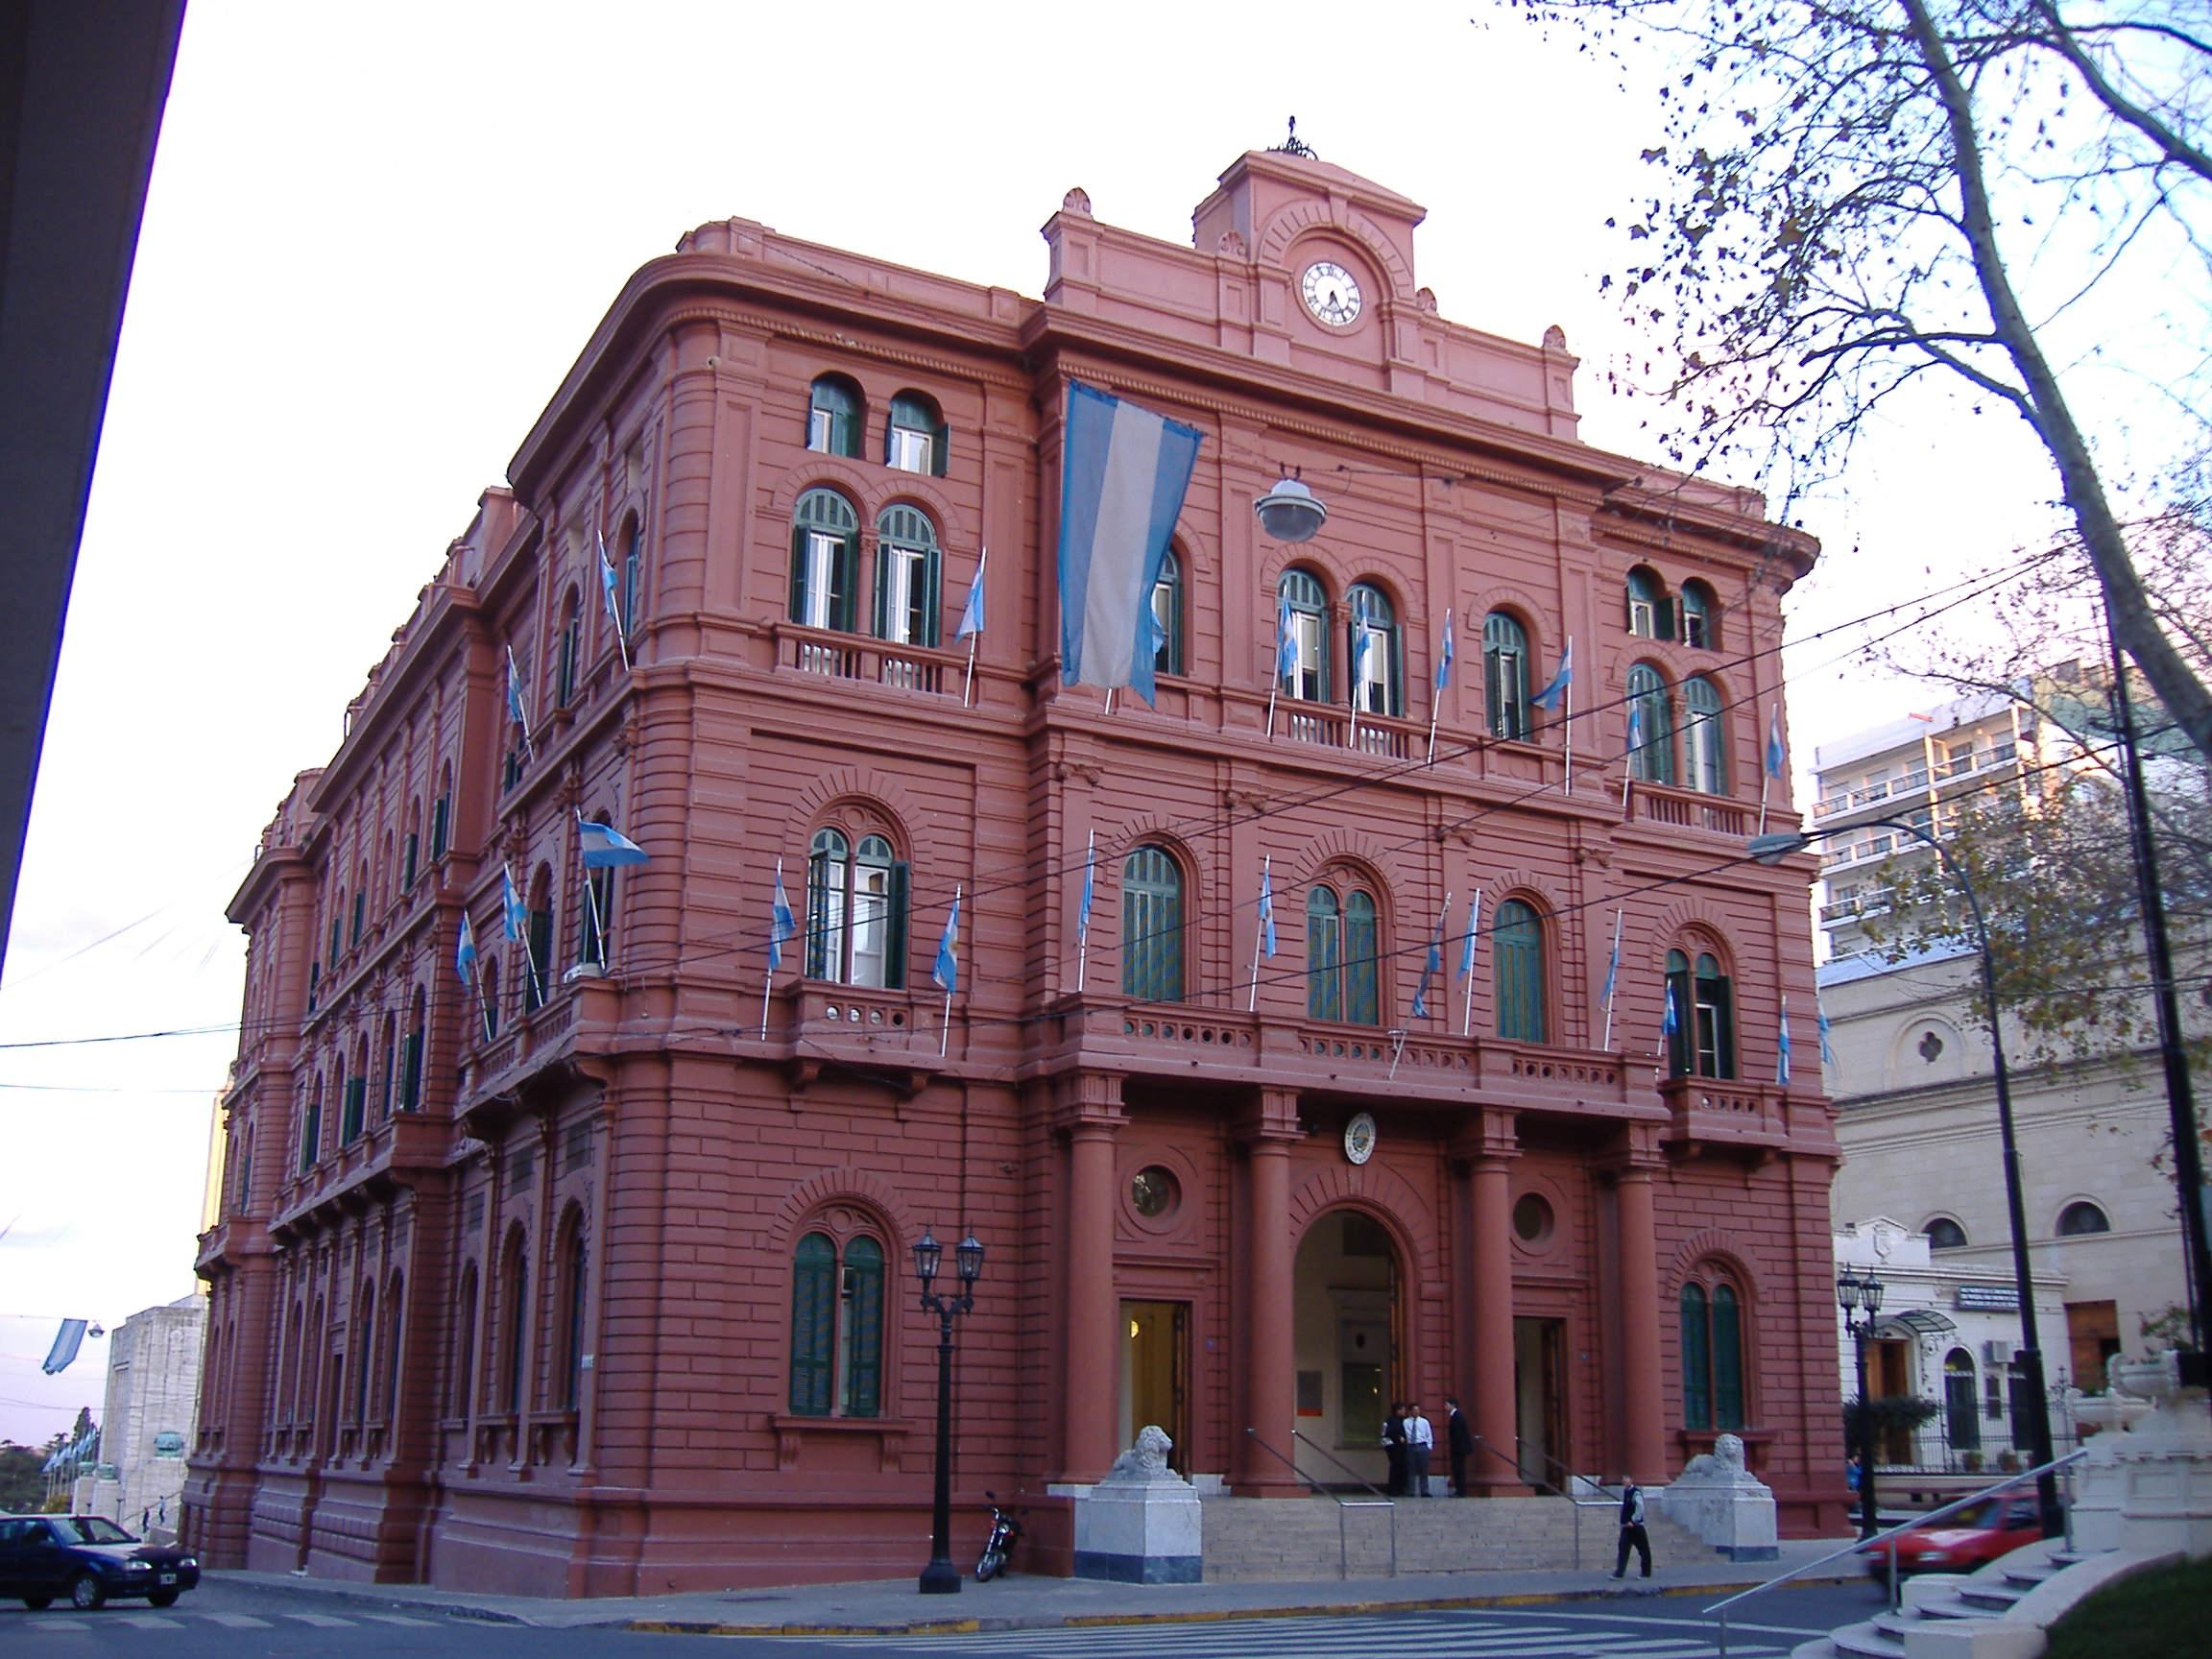 Arquitectura europea en rosario inteligencia colectiva for Arquitectura wikipedia